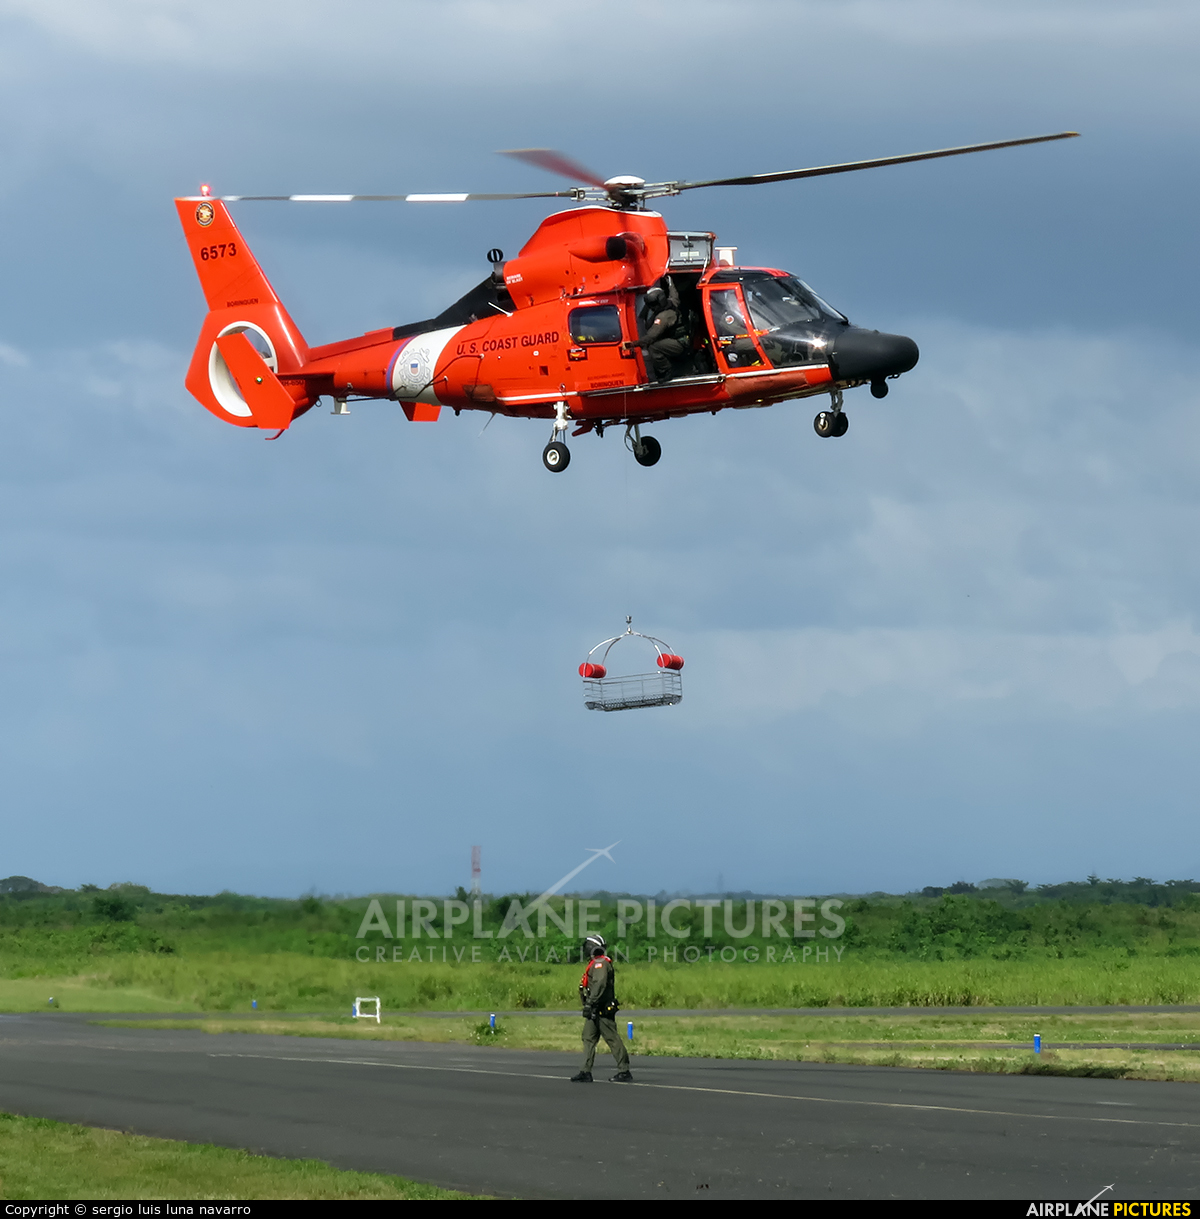 USA - Coast Guard 6573 aircraft at Off Airport - Dominican Republic